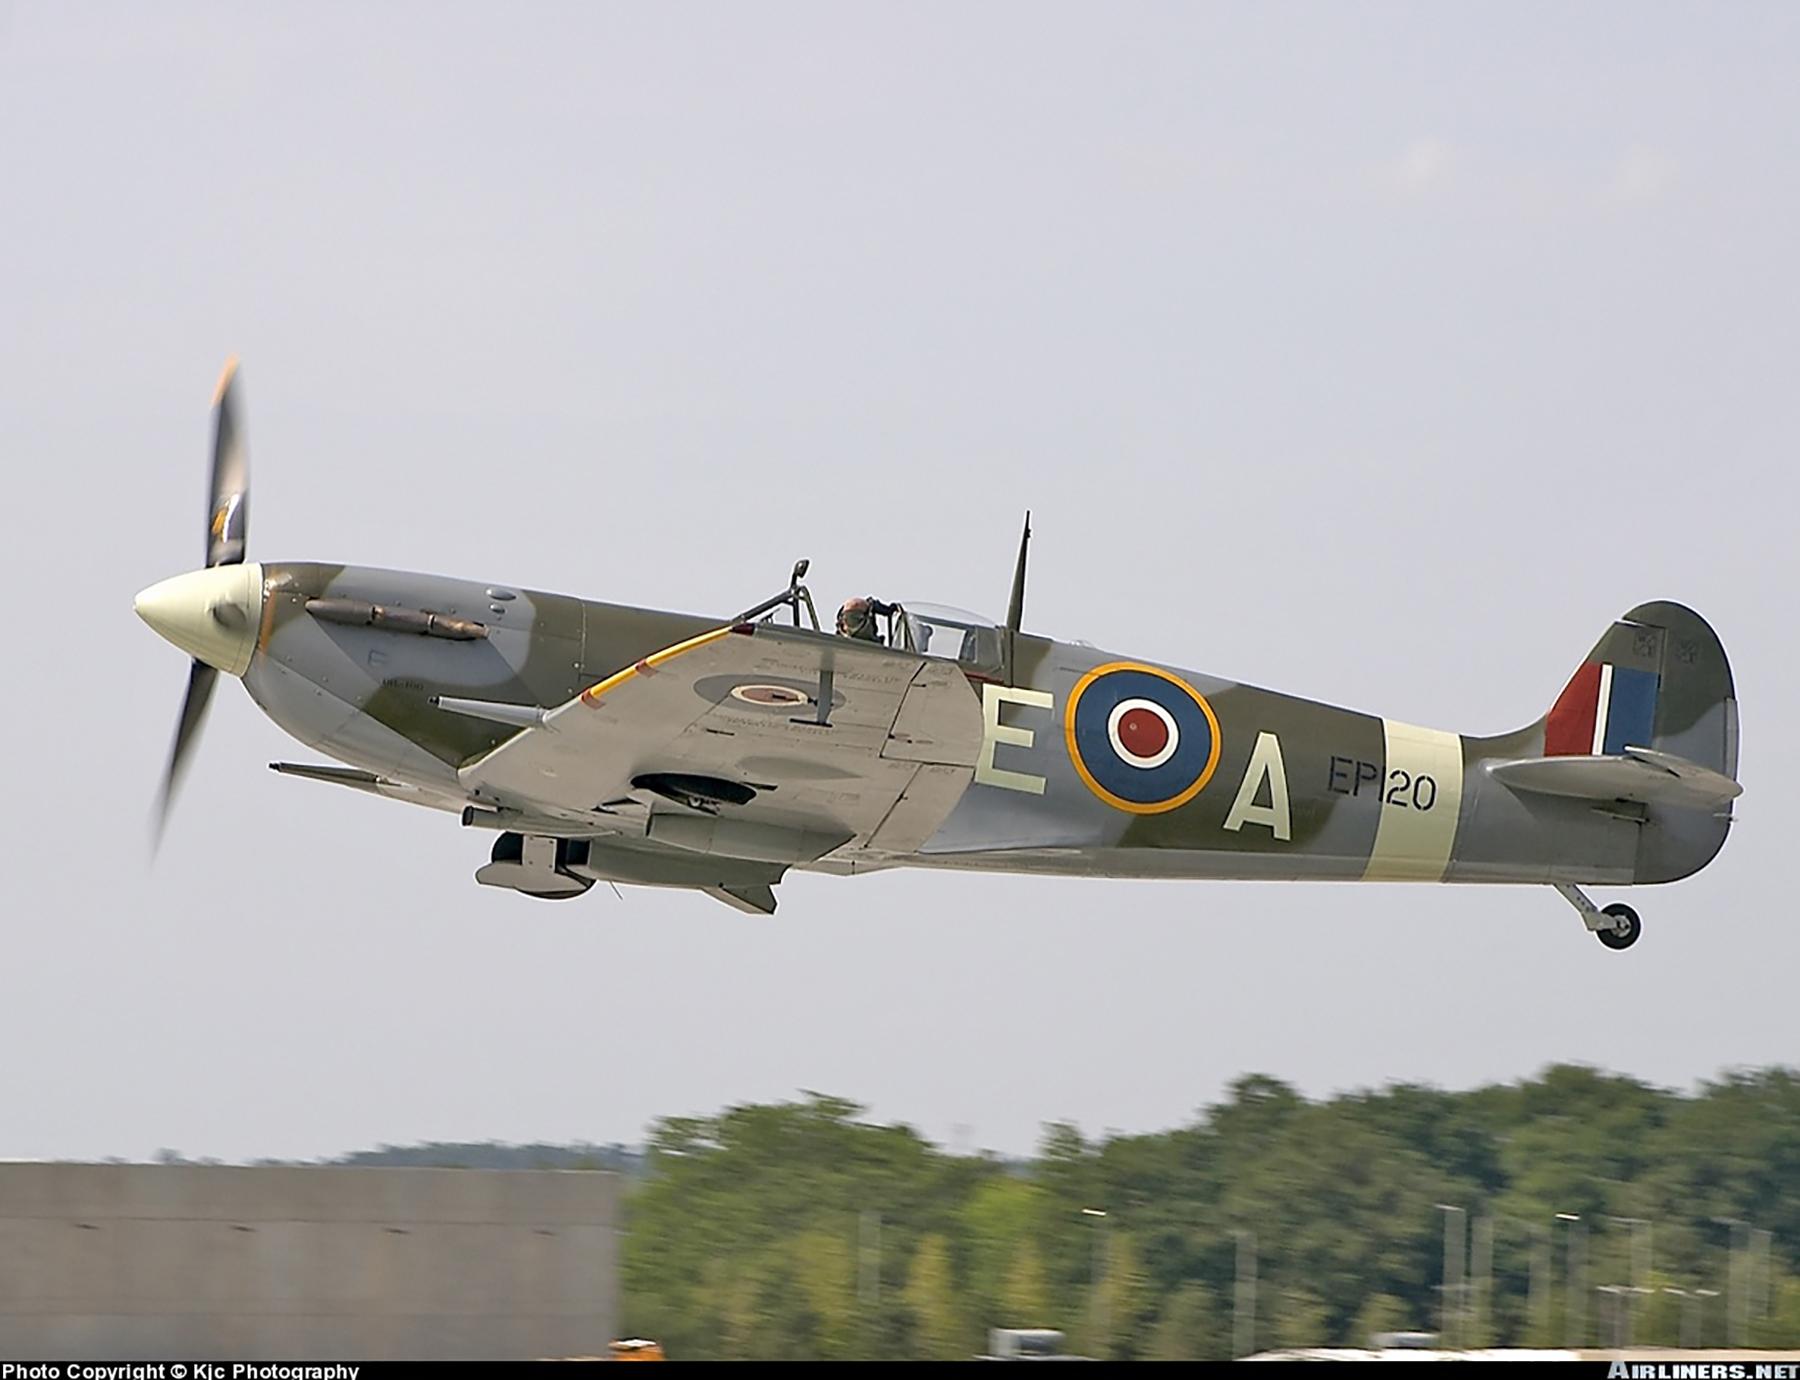 Airworthy Spitfire warbird LFVb RCAF 402Sqn AEA EP120 04